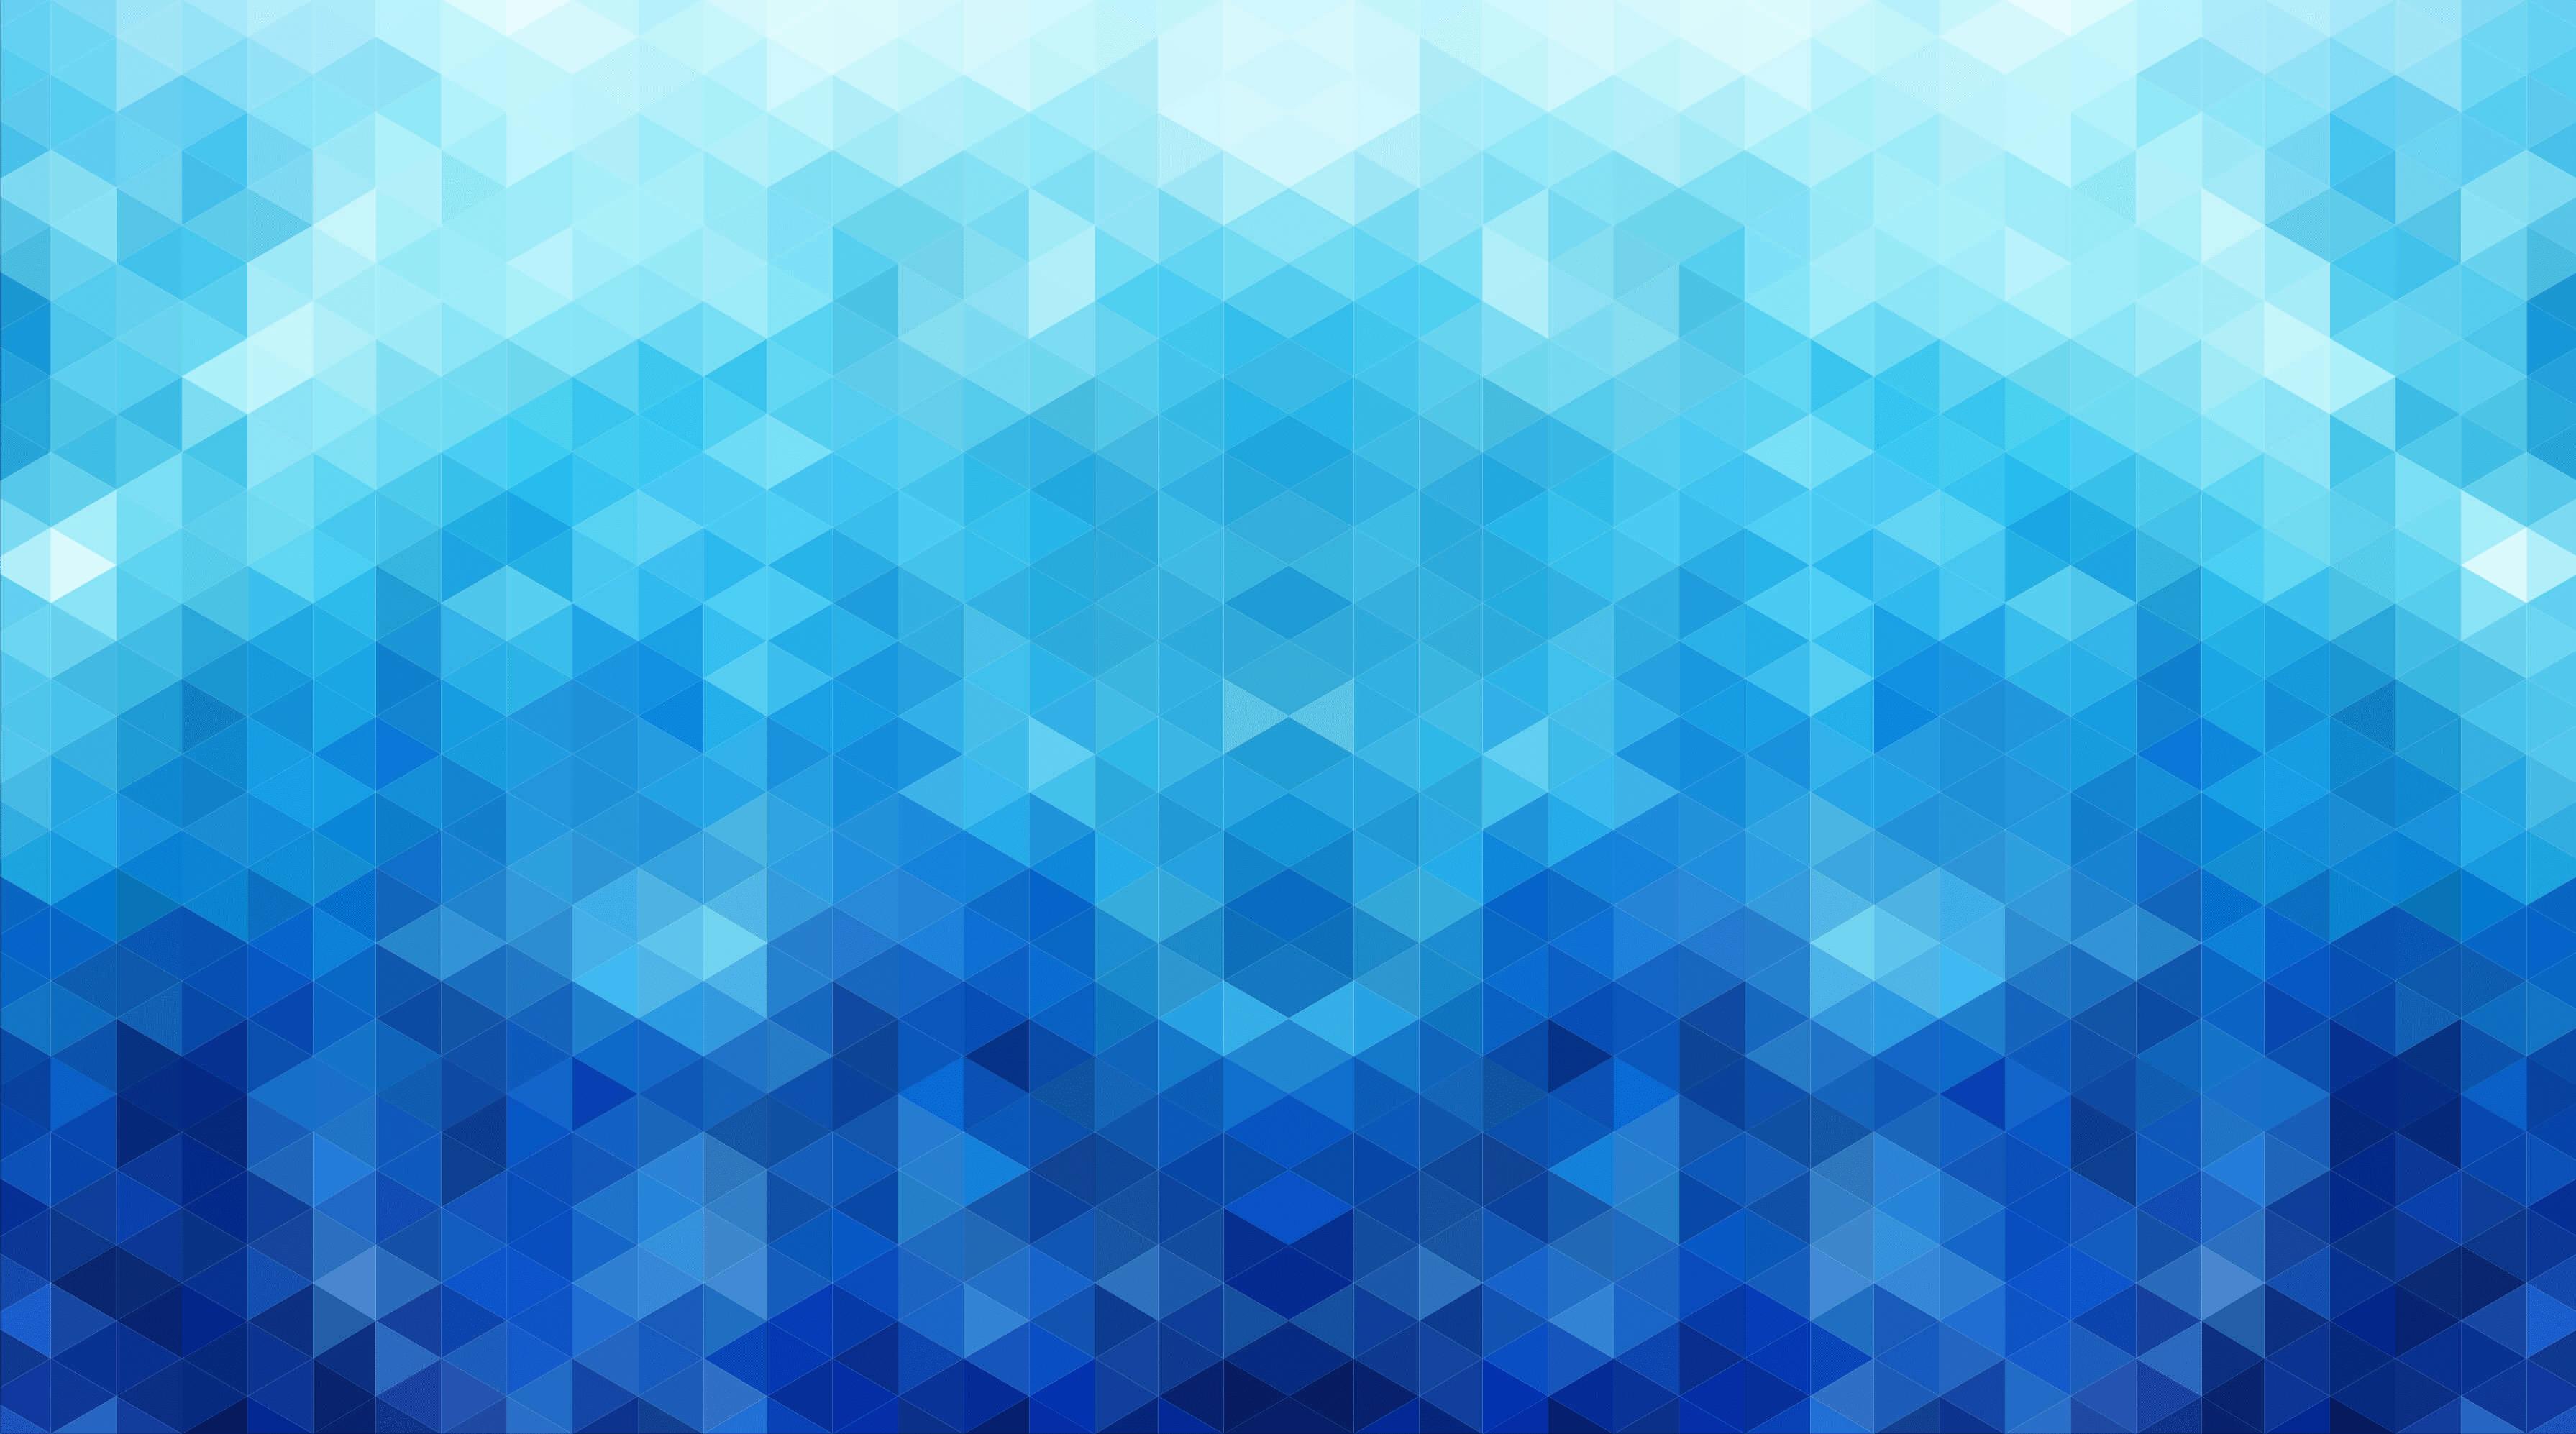 Blue Geometric Wallpapers Top Free Blue Geometric